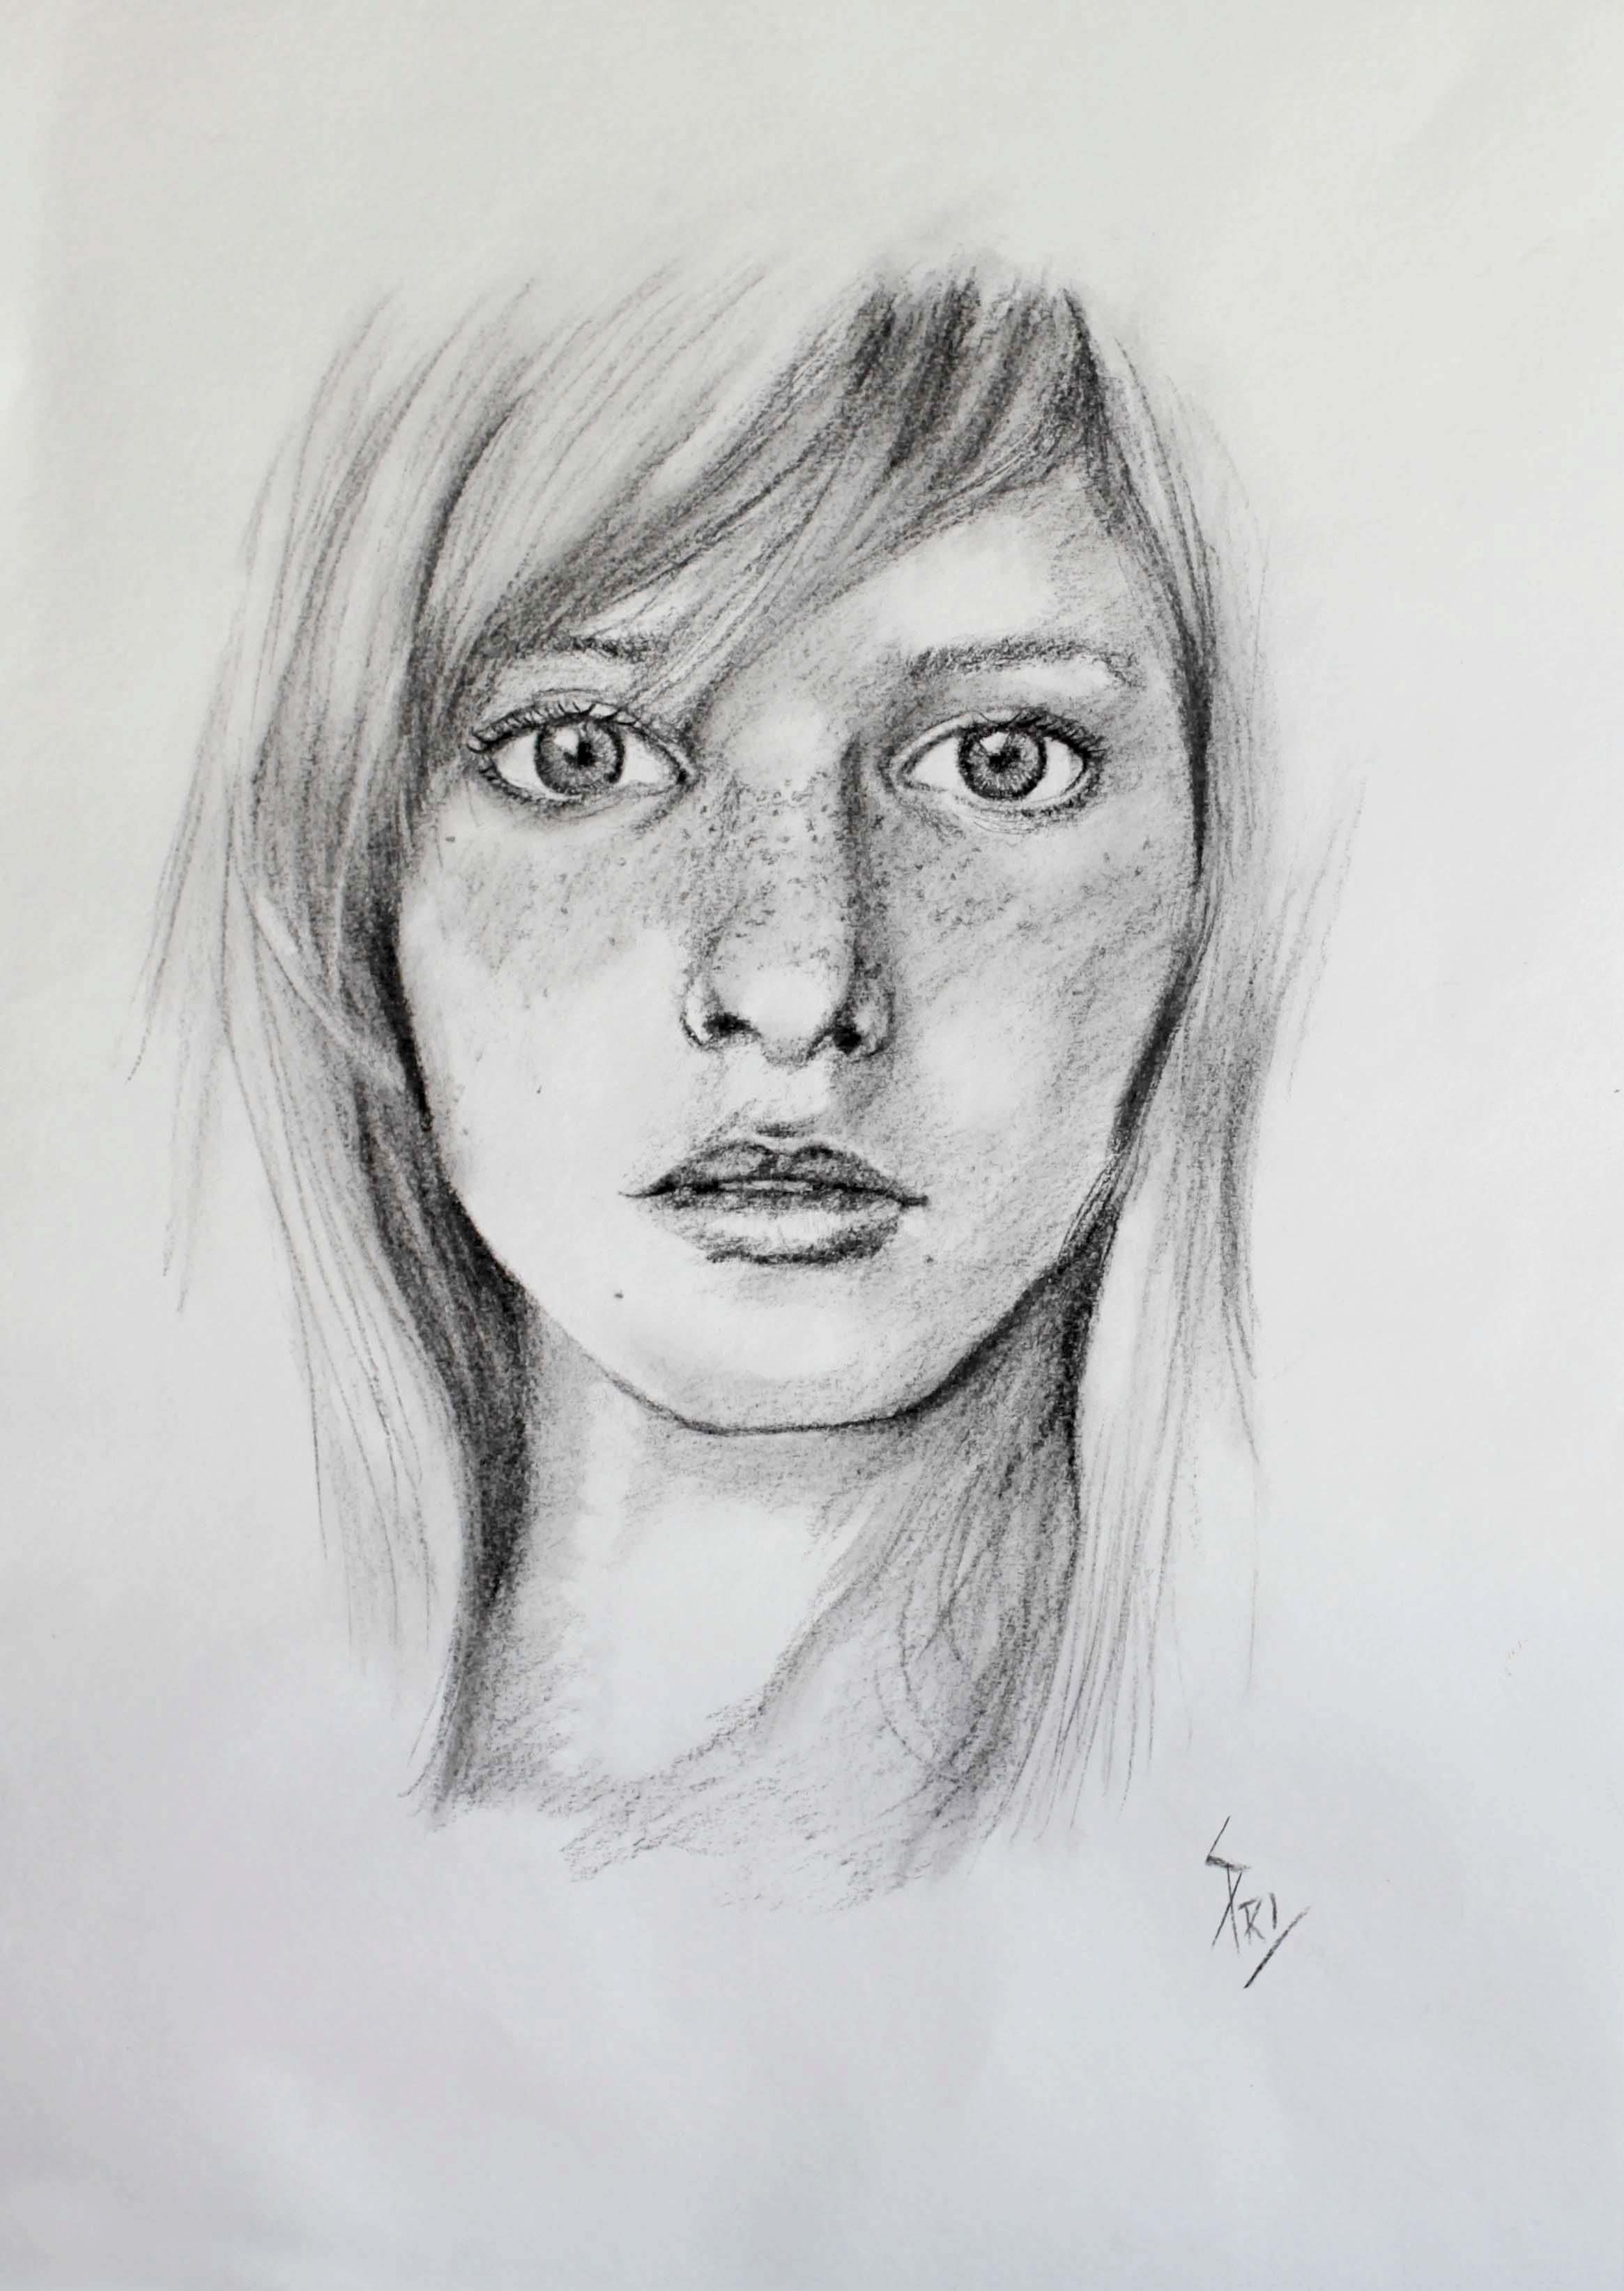 Dessin par Priscilla Seiller, Artiste-Peintre